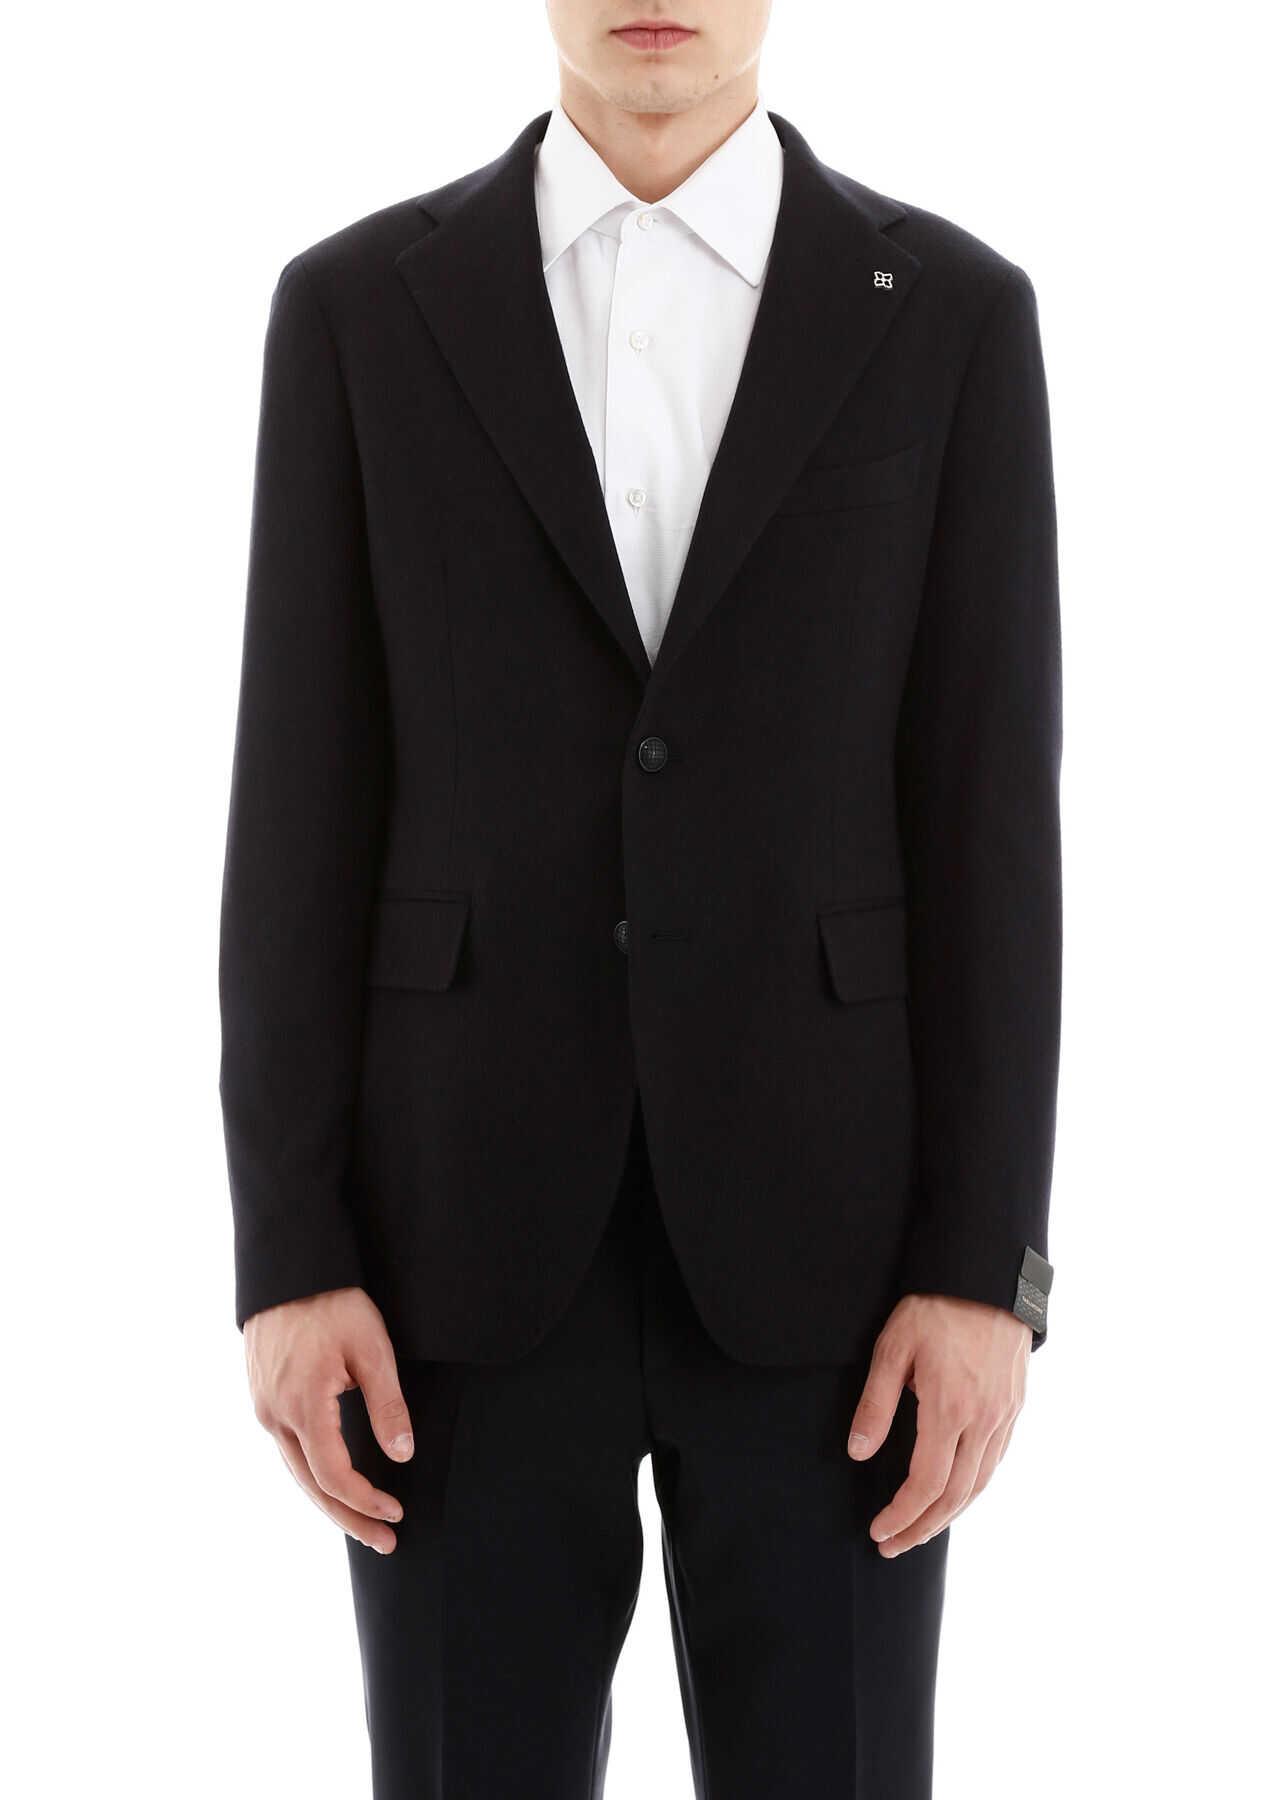 Tagliatore Formal Vesuvio Jacket NAVY imagine